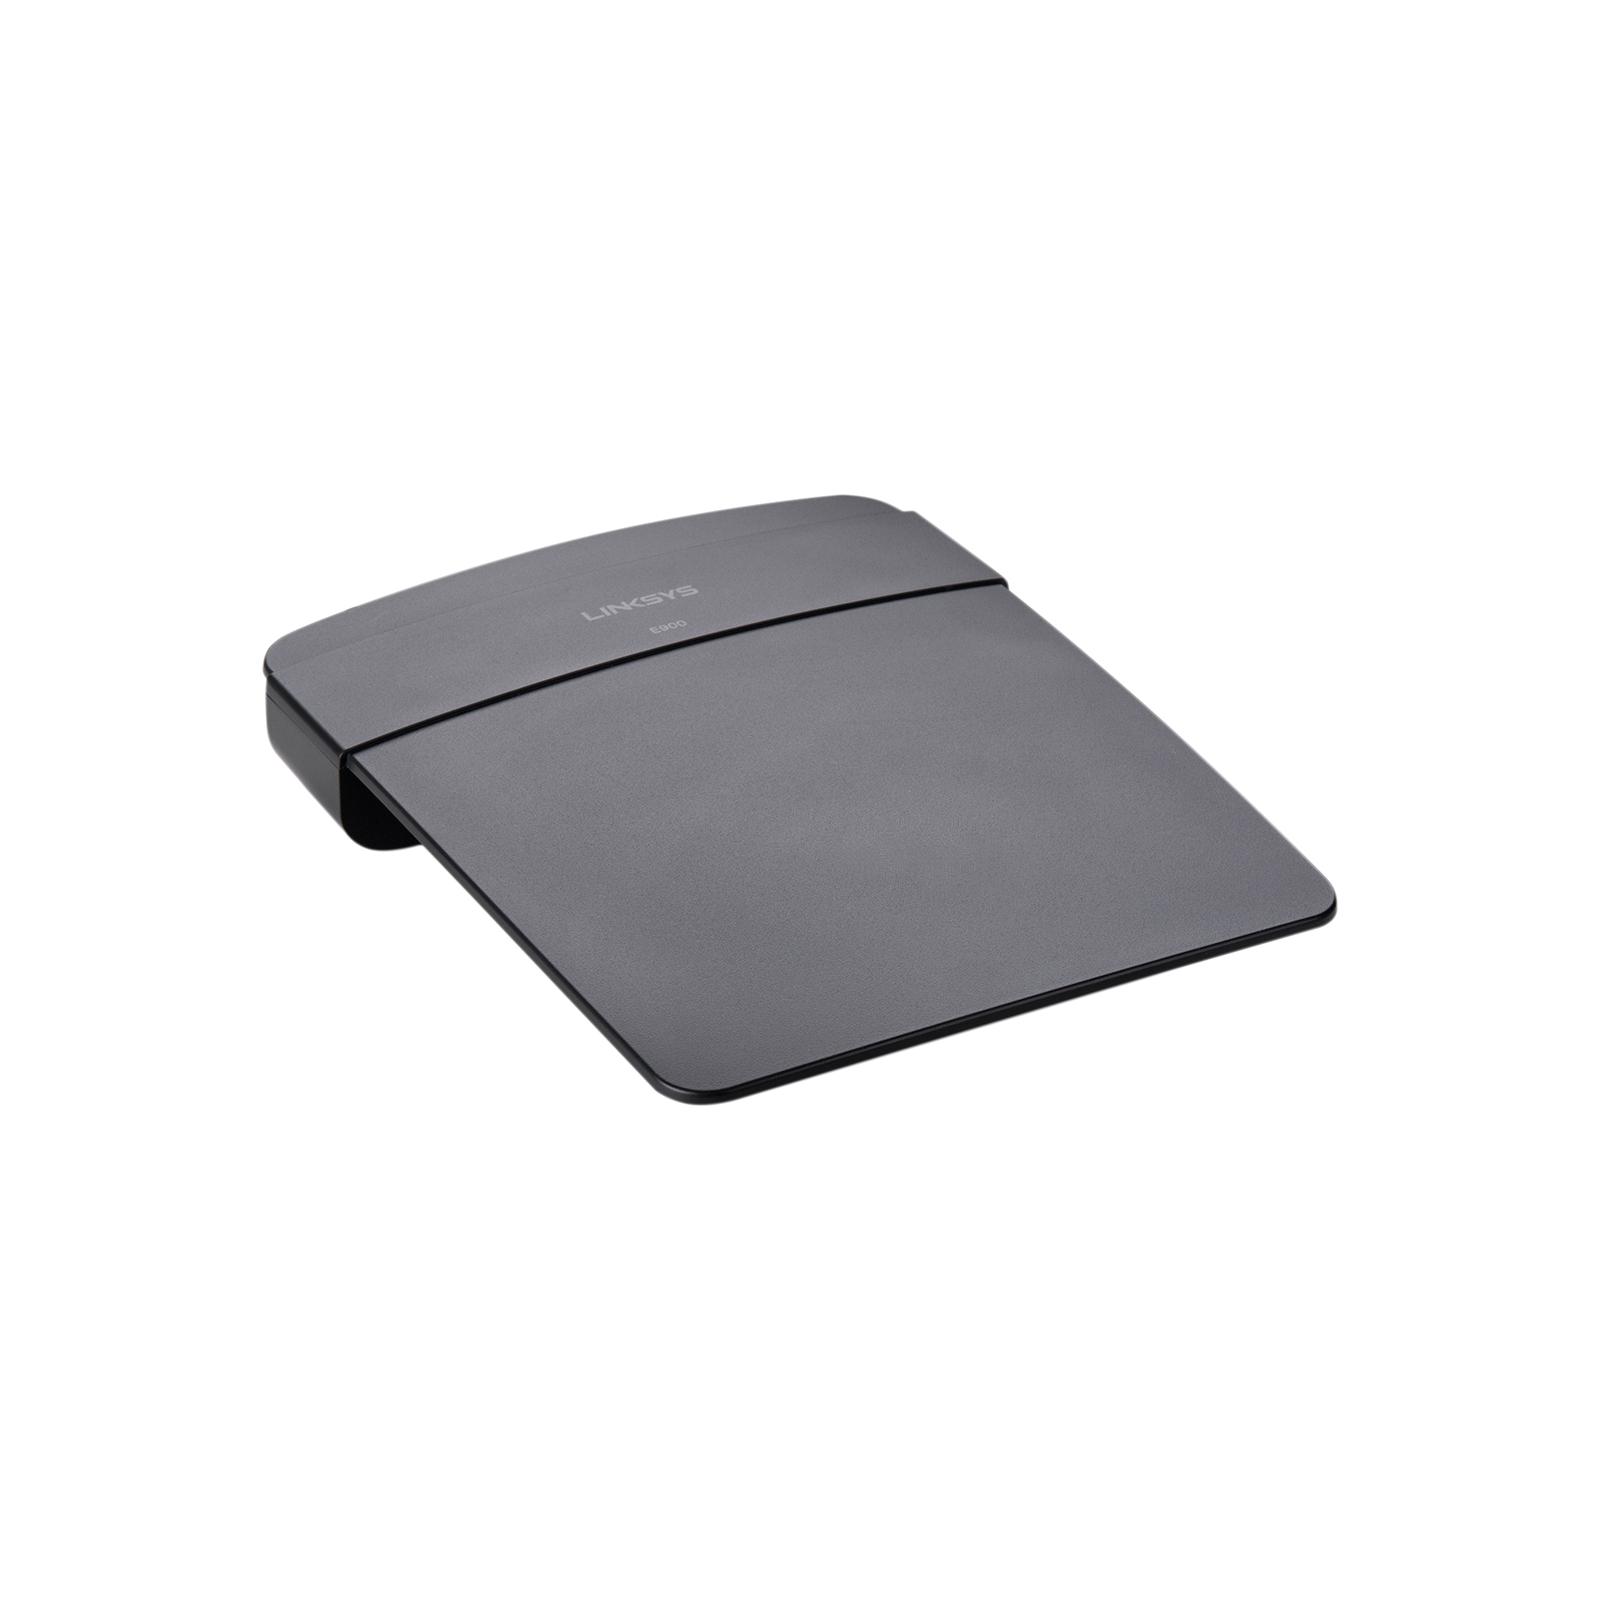 Маршрутизатор LinkSys E900 изображение 3